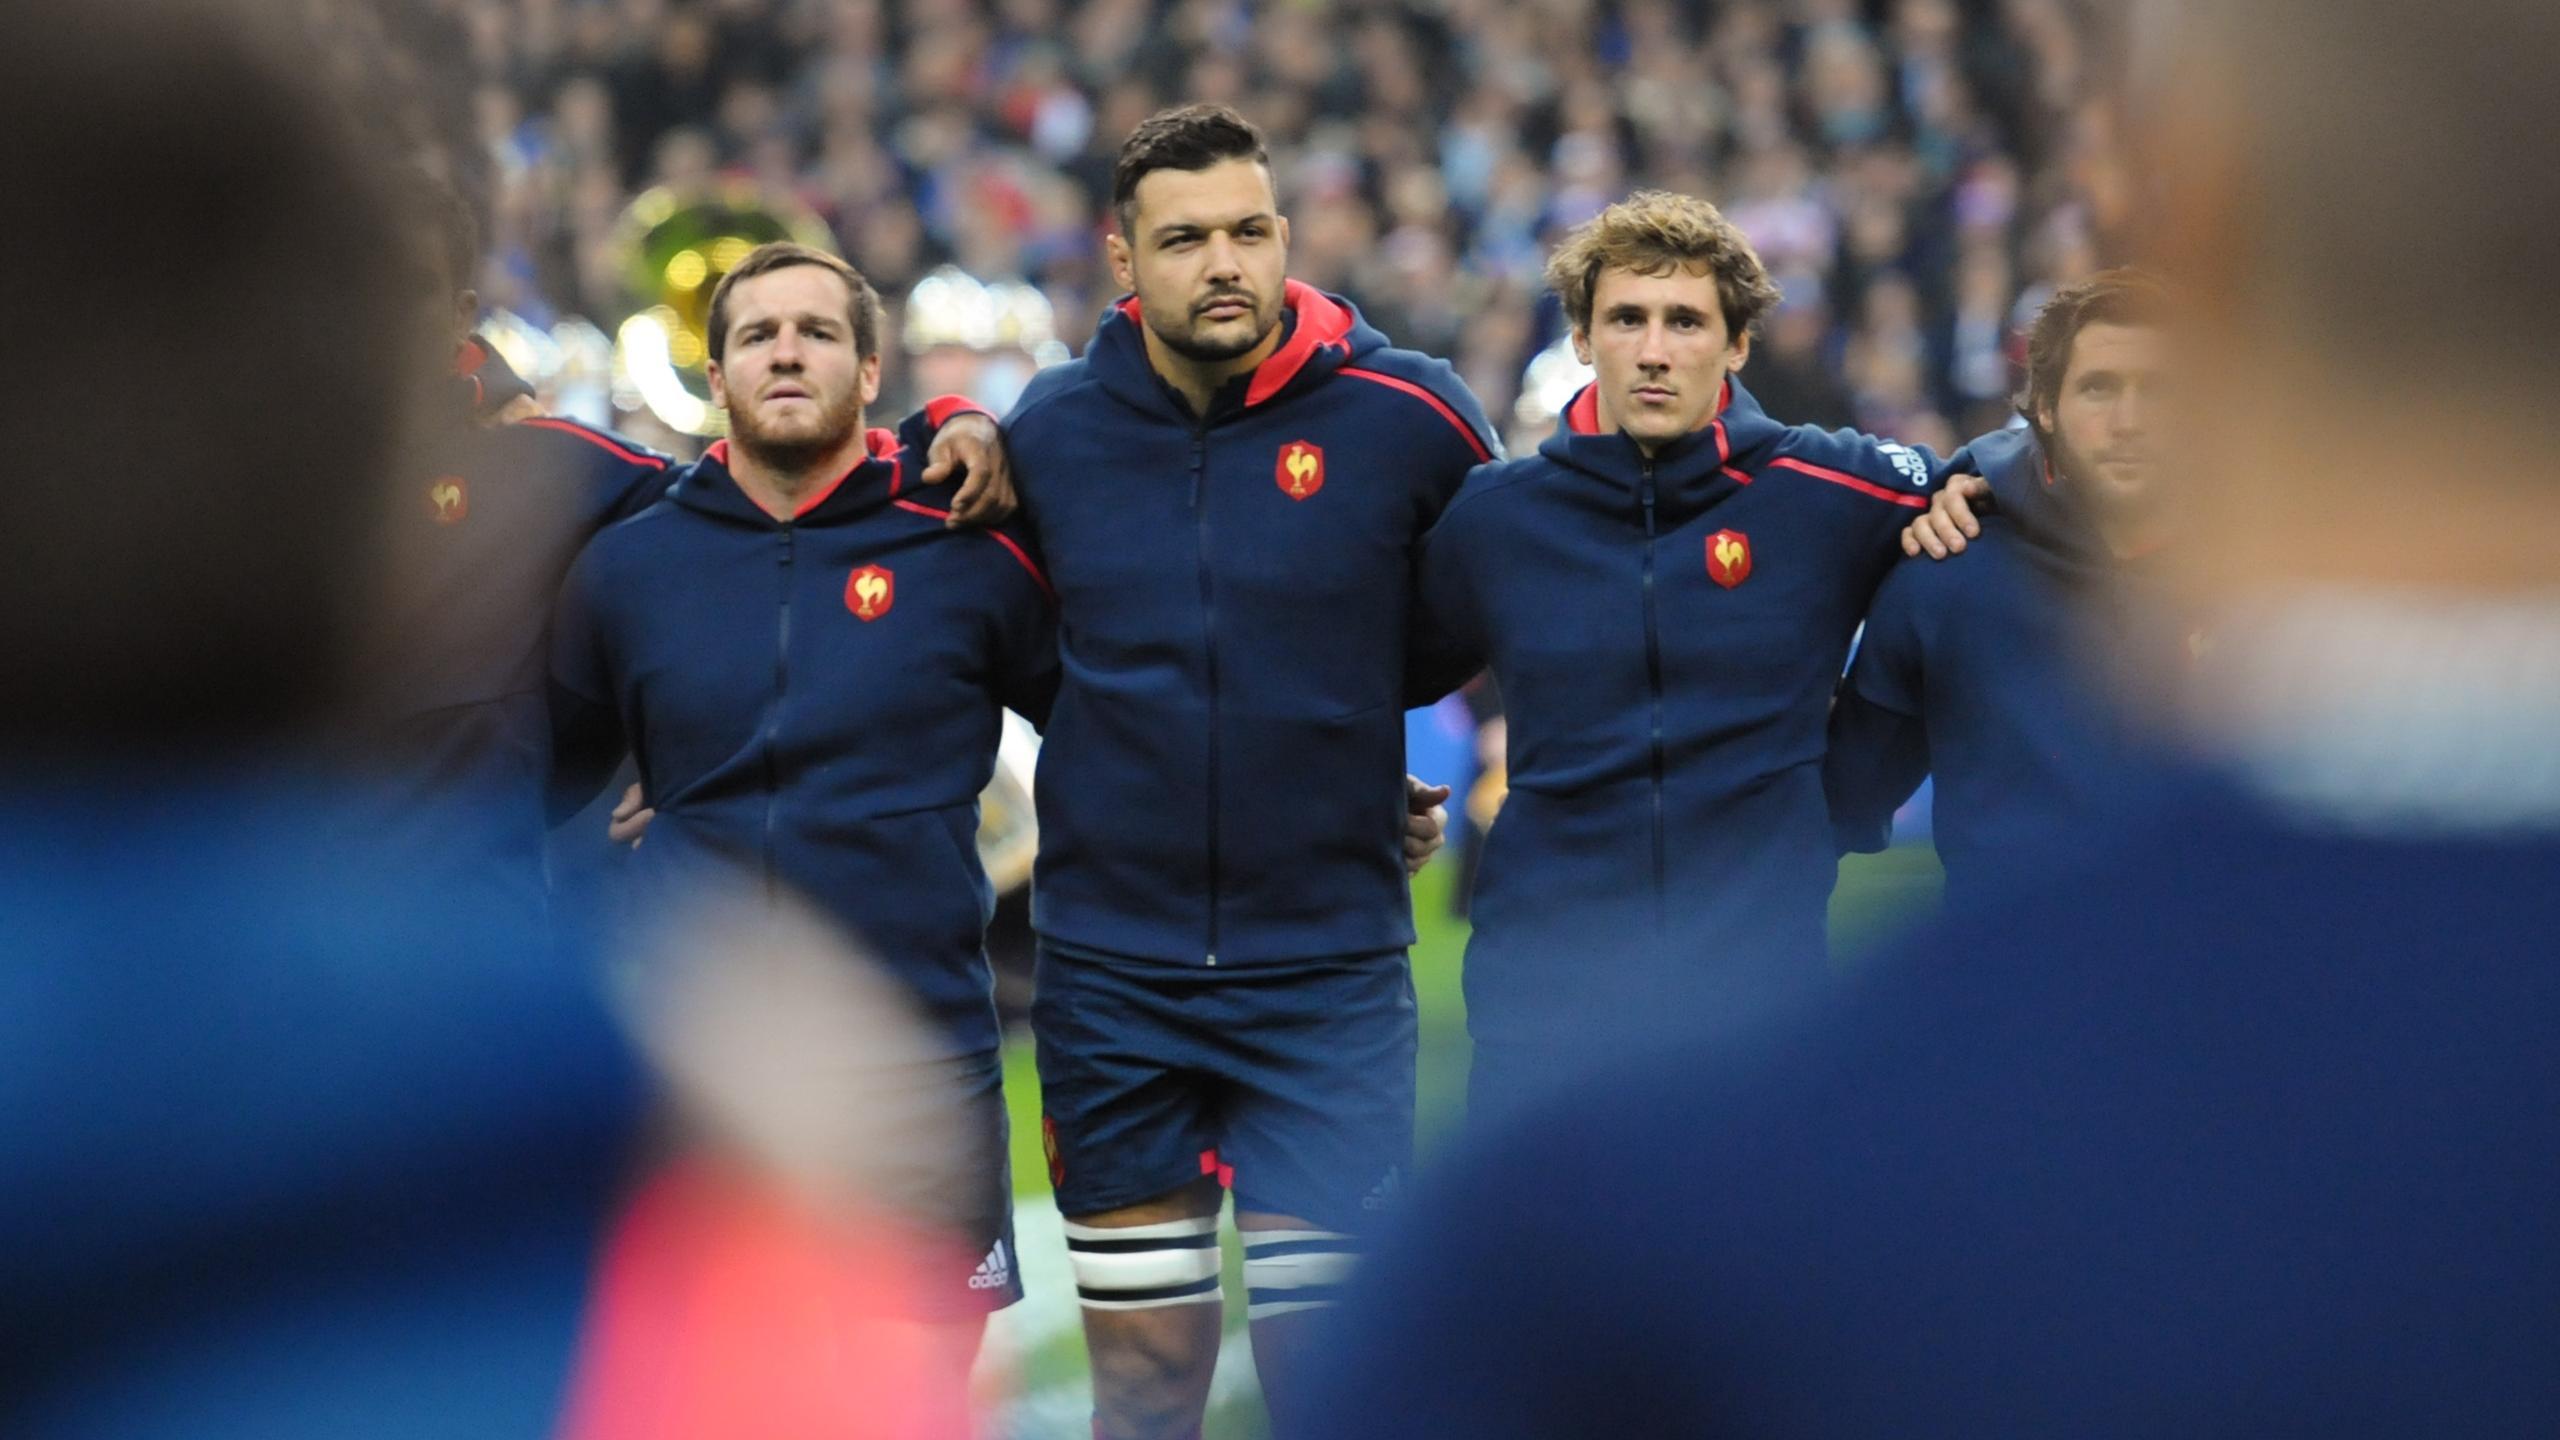 Damien Chouly (XV de France) - Novembre 2016